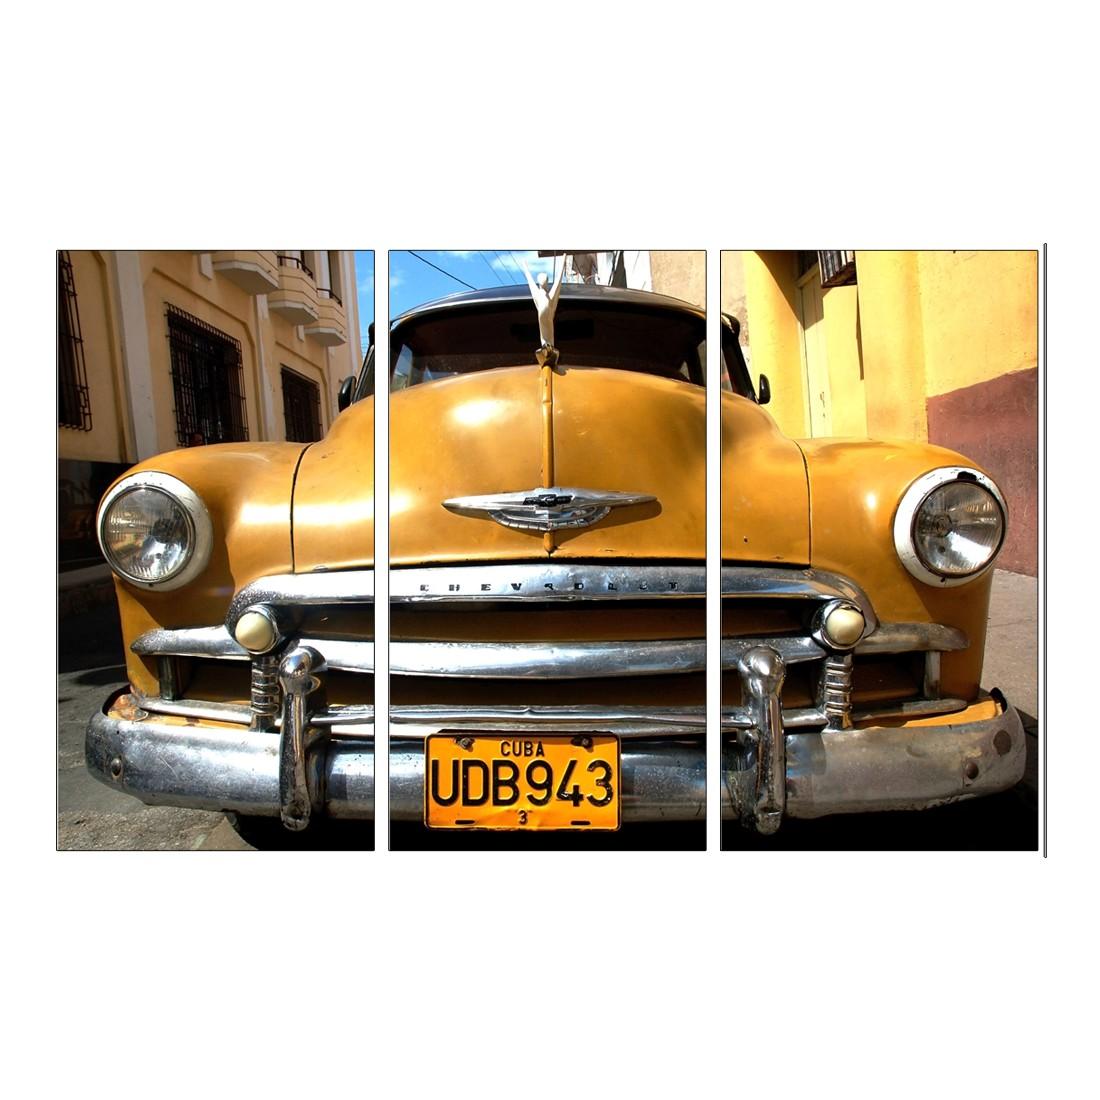 Leinwandbild Cuba II – 120 x 80cm, Gallery of Innovative Art günstig